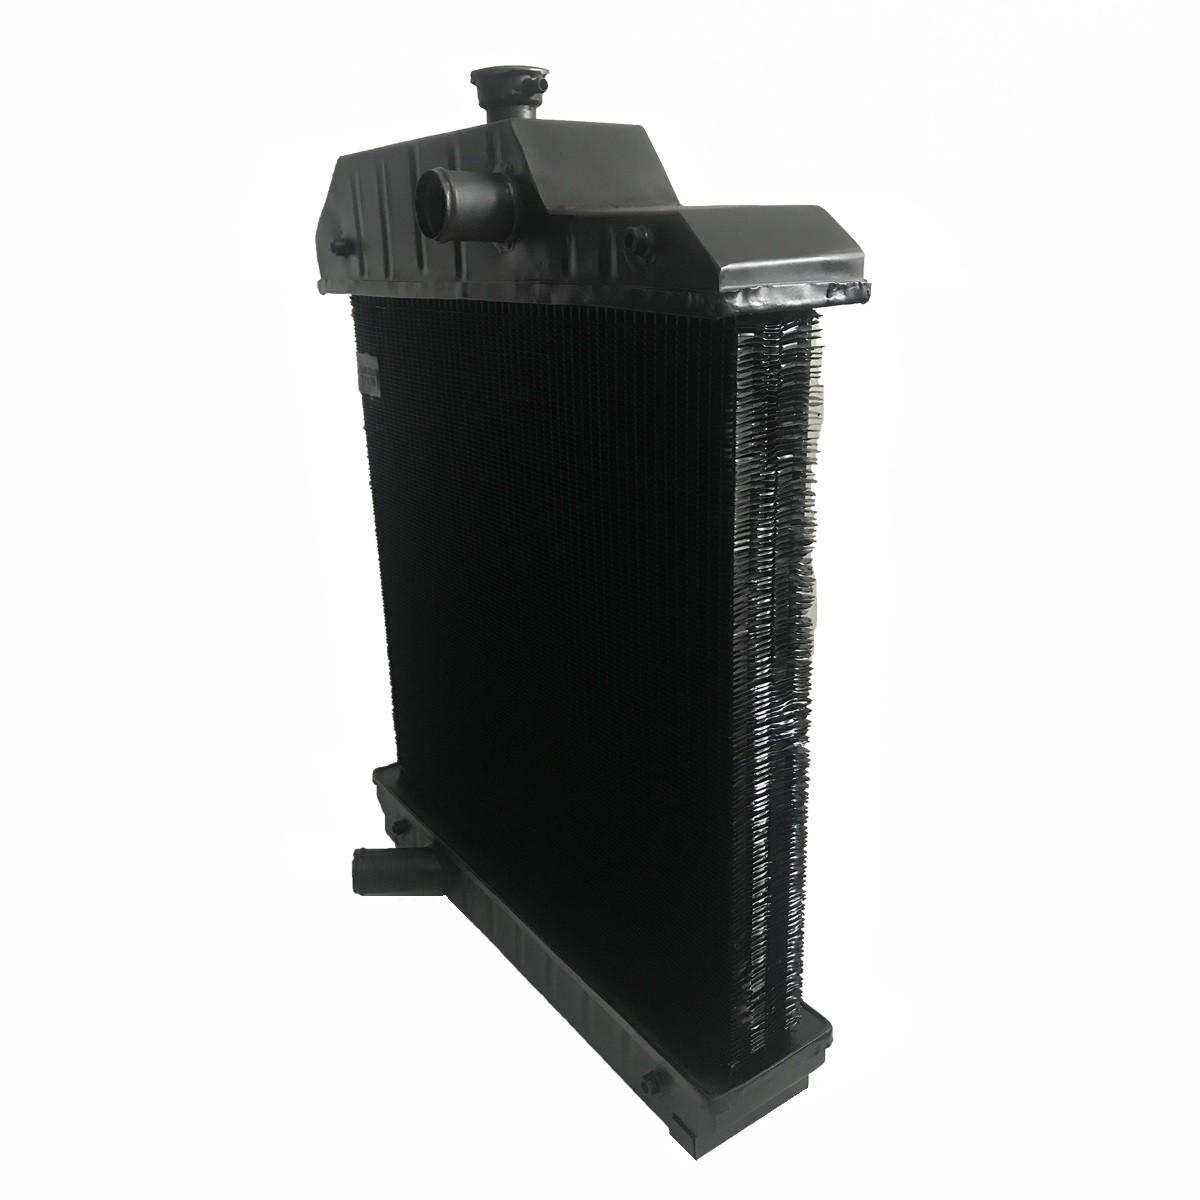 Radiador Massey Fergusson 275 Advanced 460x483x4ob - ARJ RADIADORES